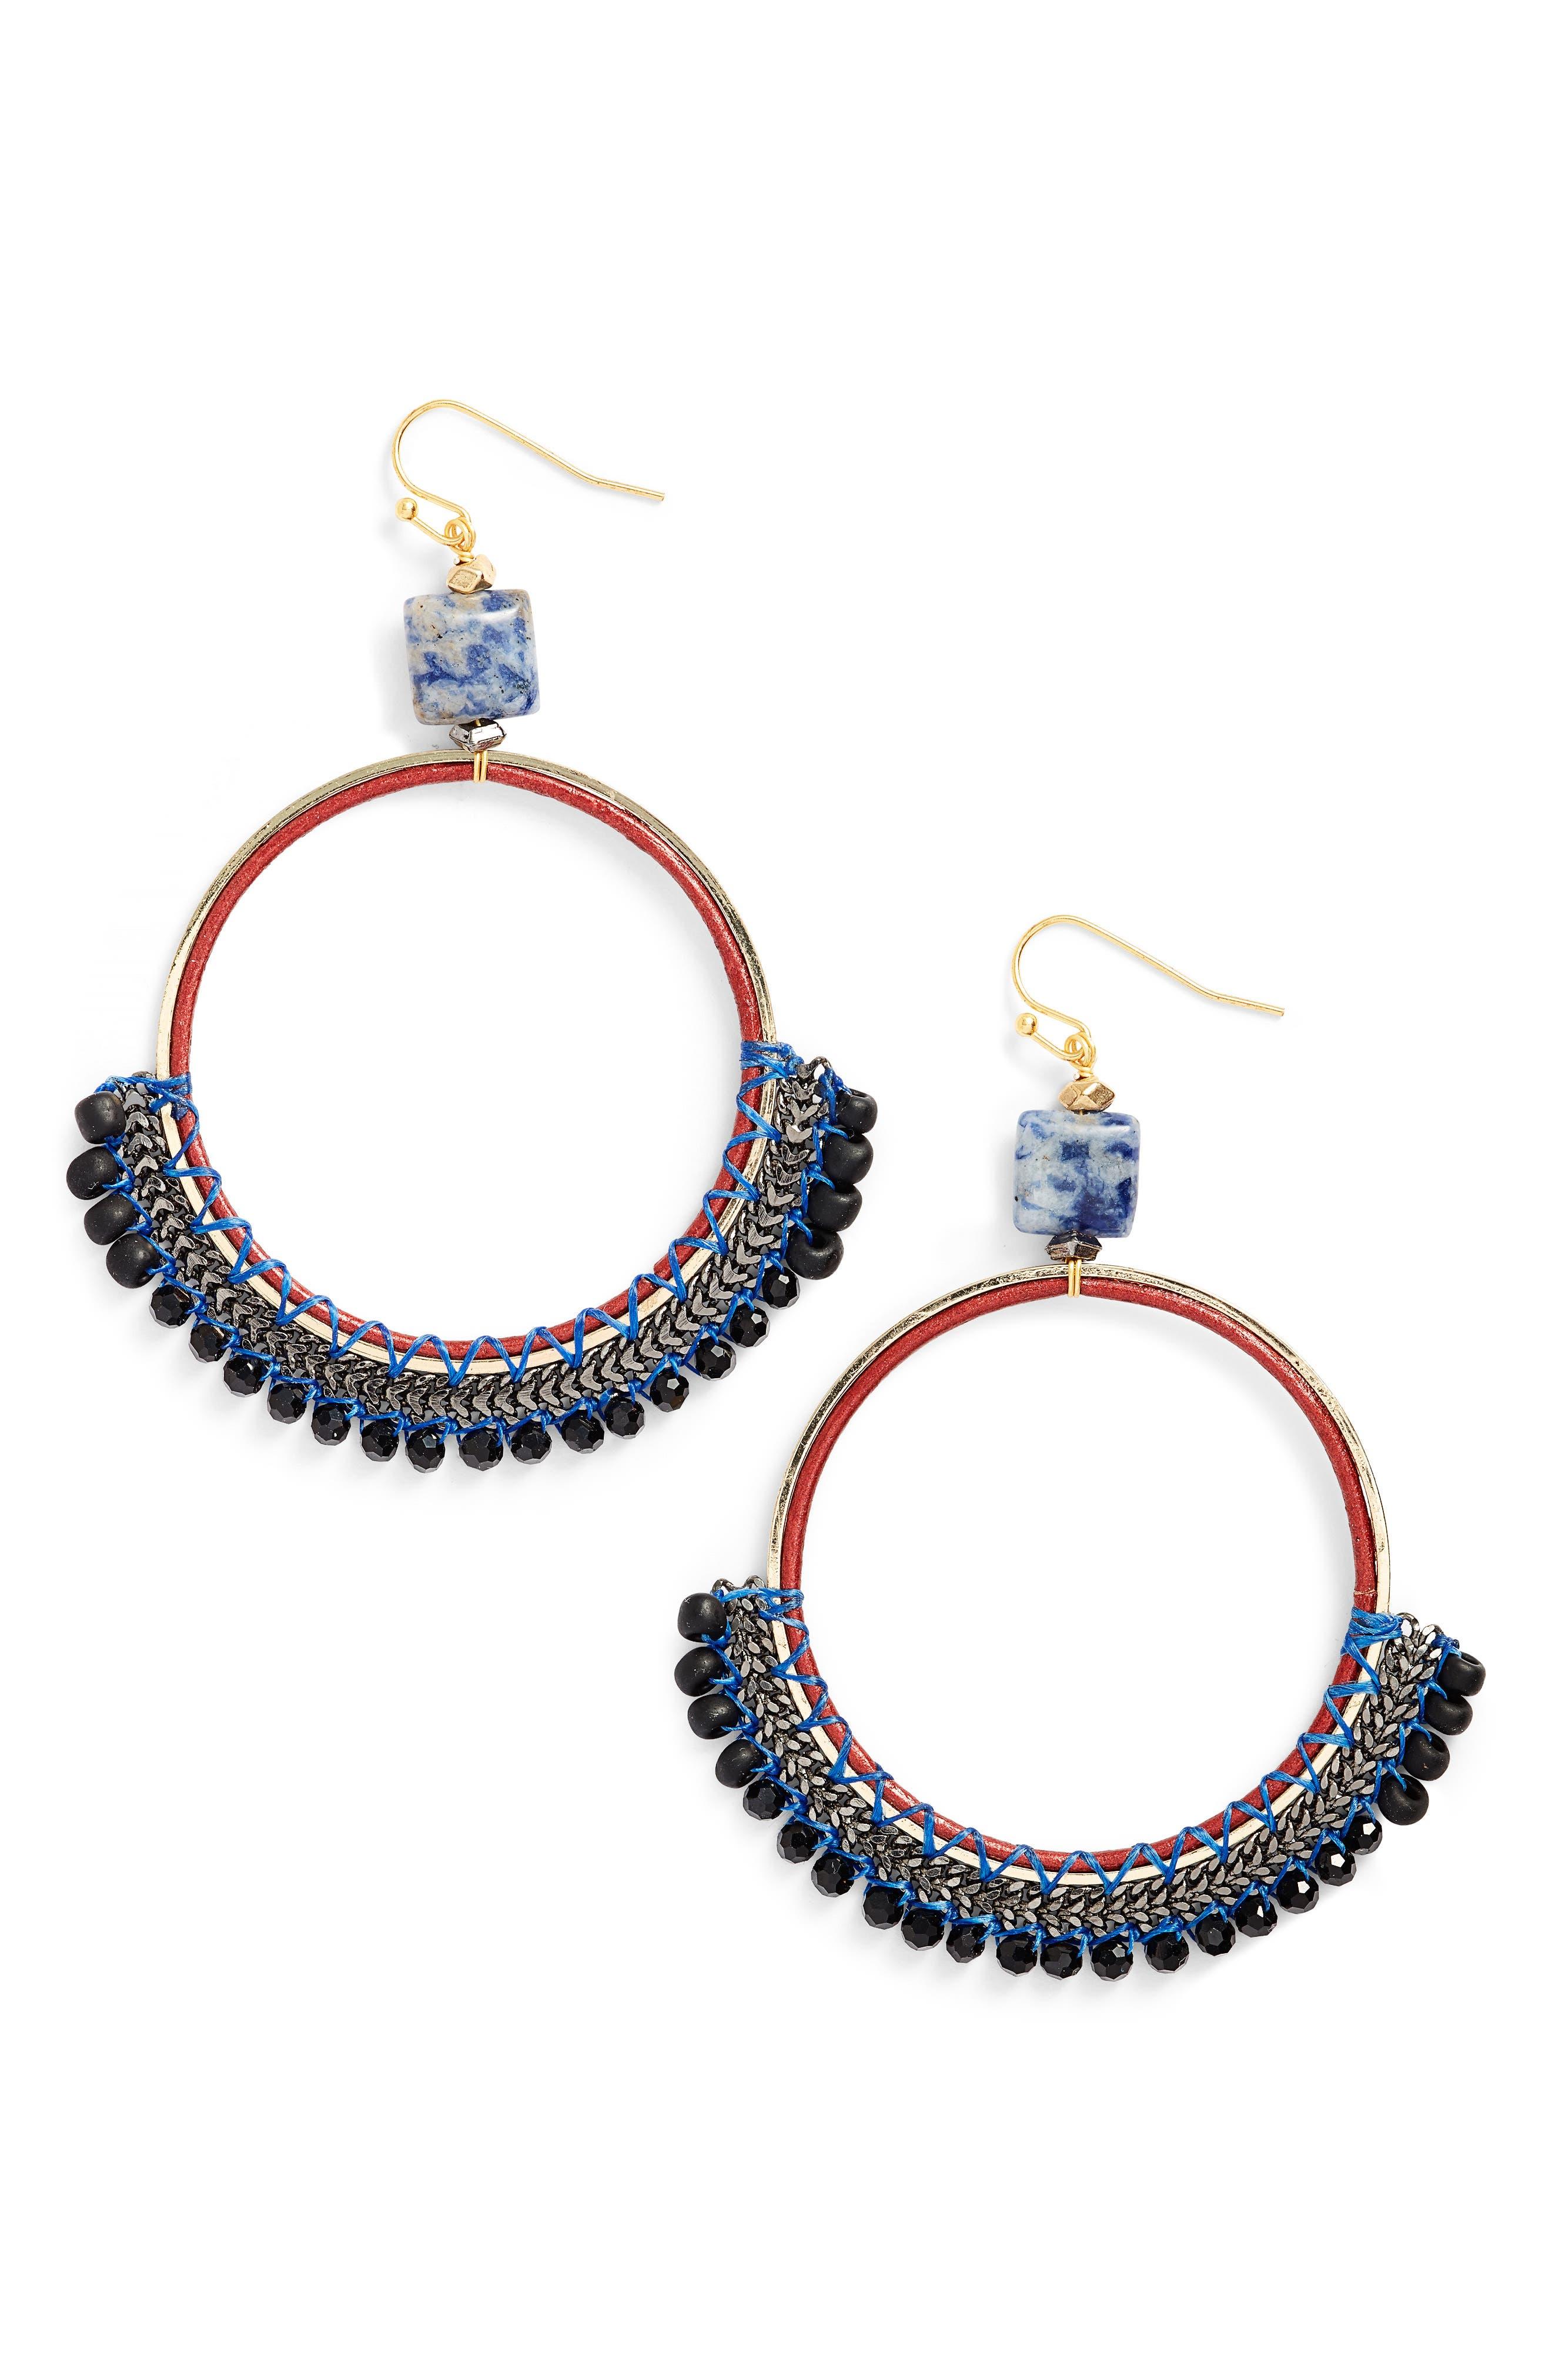 Main Image - Nakamol Design Bachubai Crystal & Chain Hoop Earrings